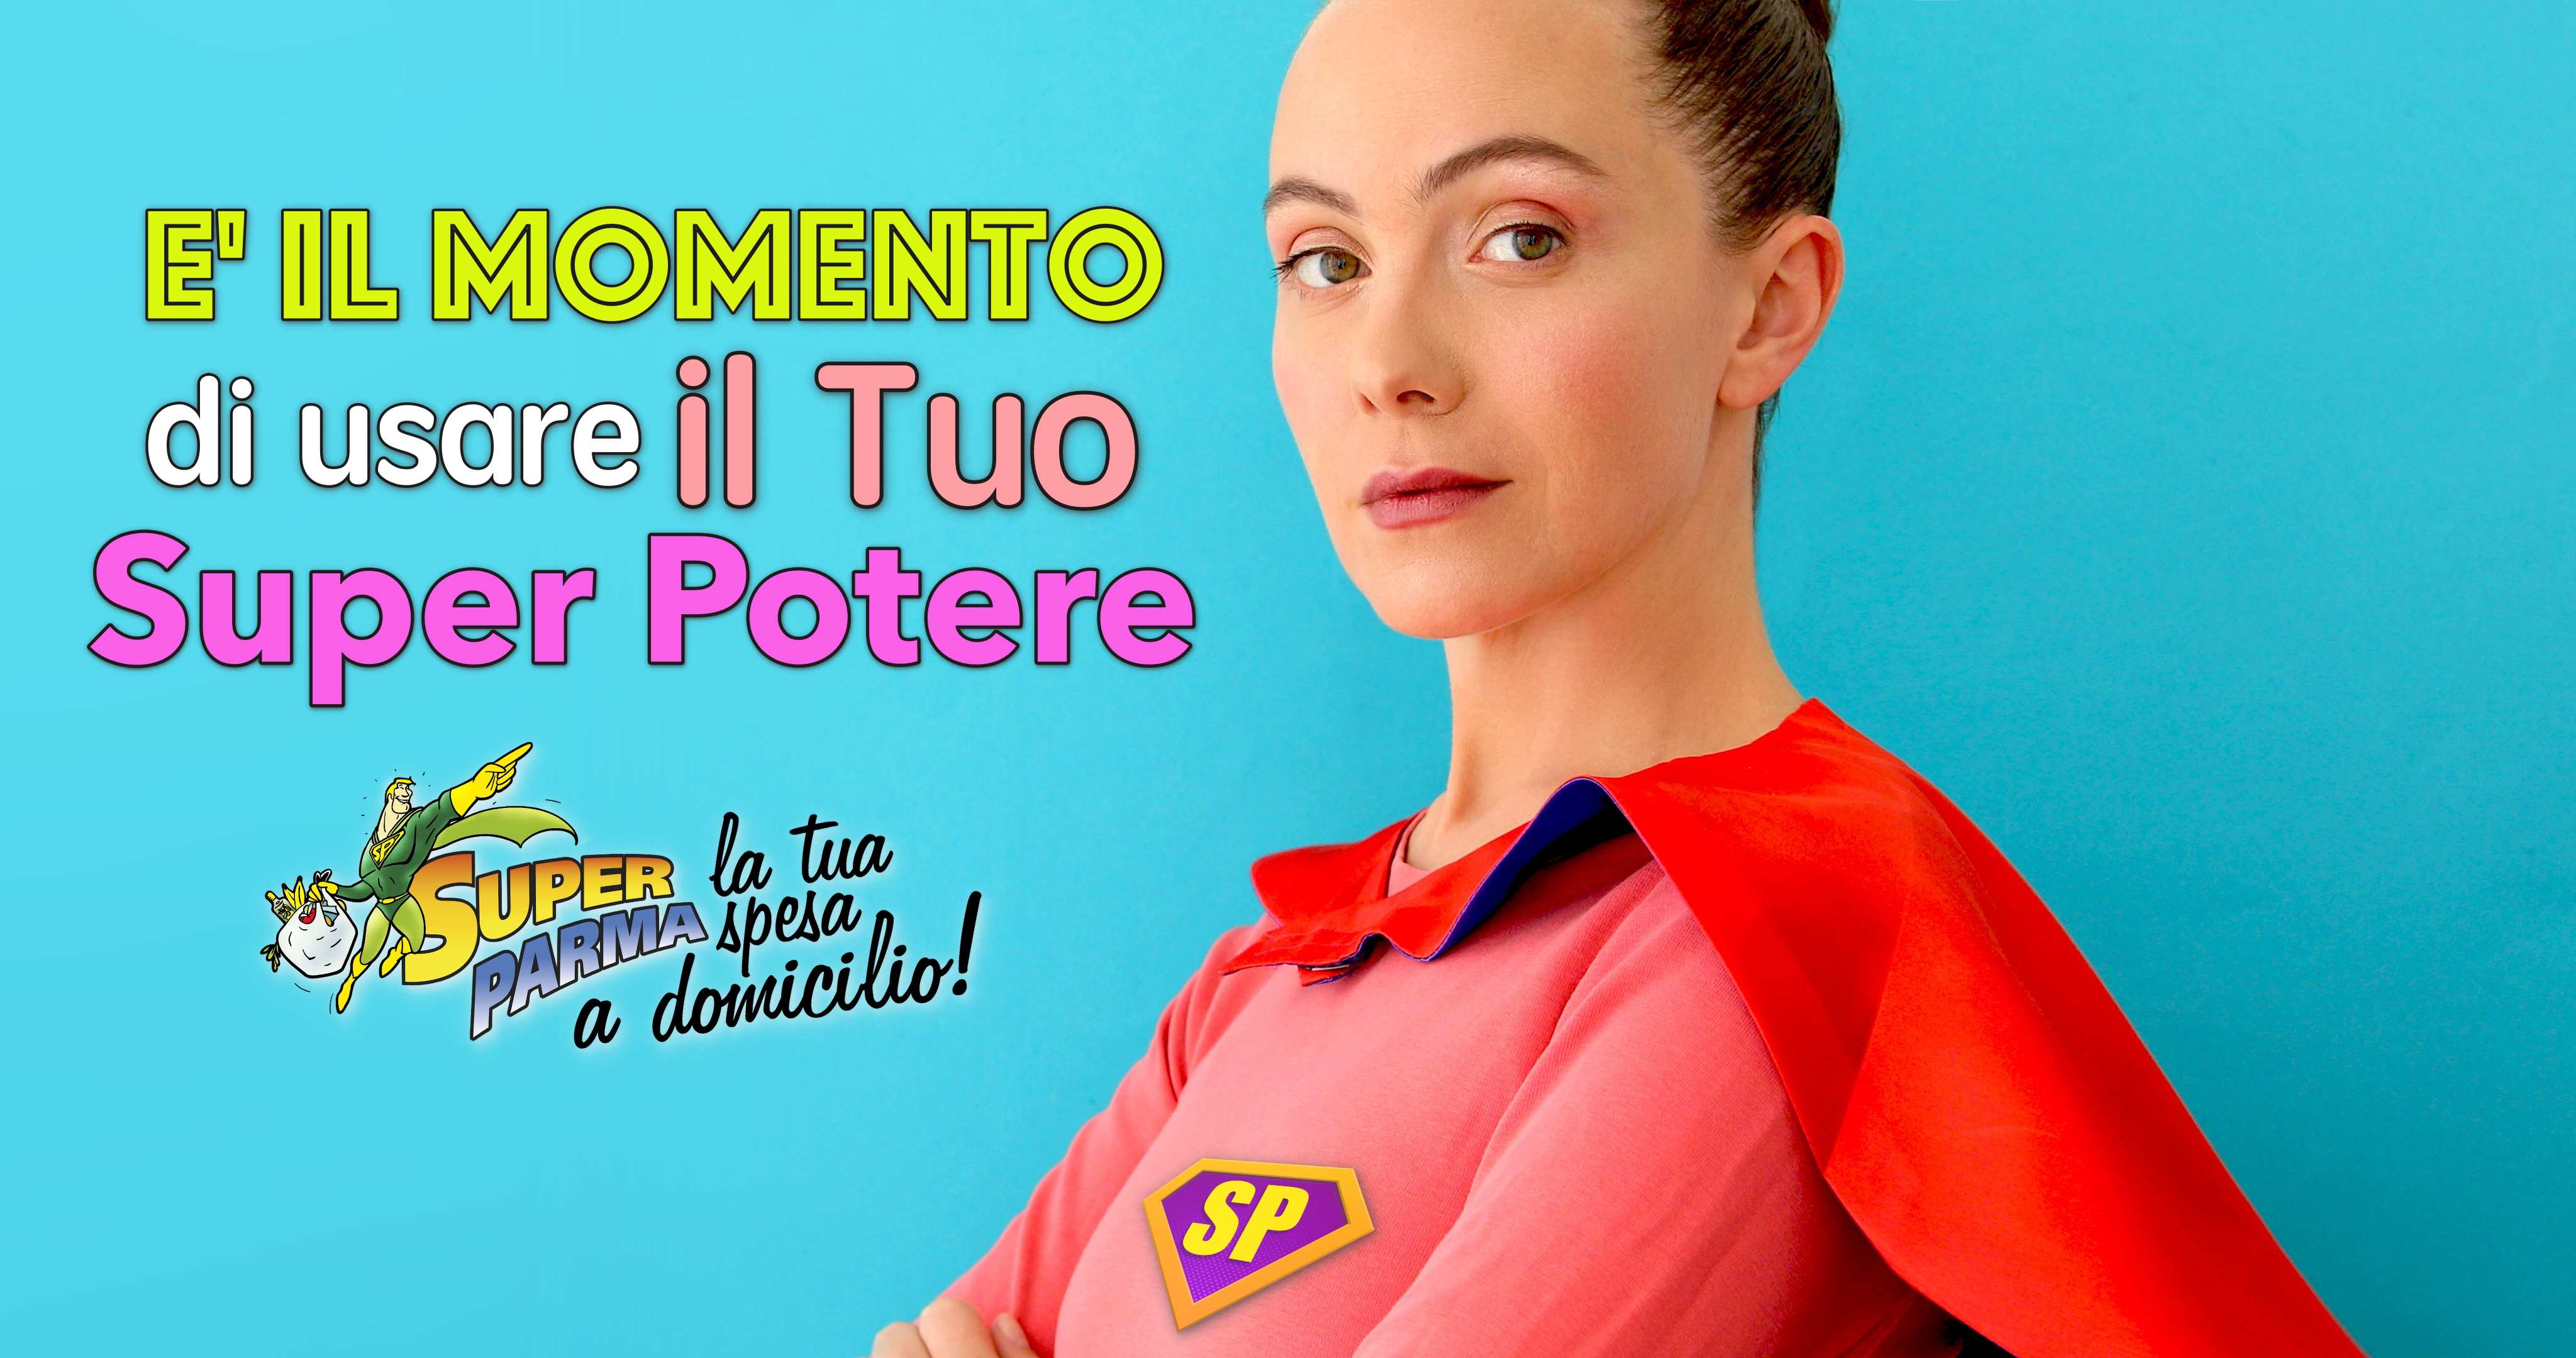 promoSP_superpoteri2020